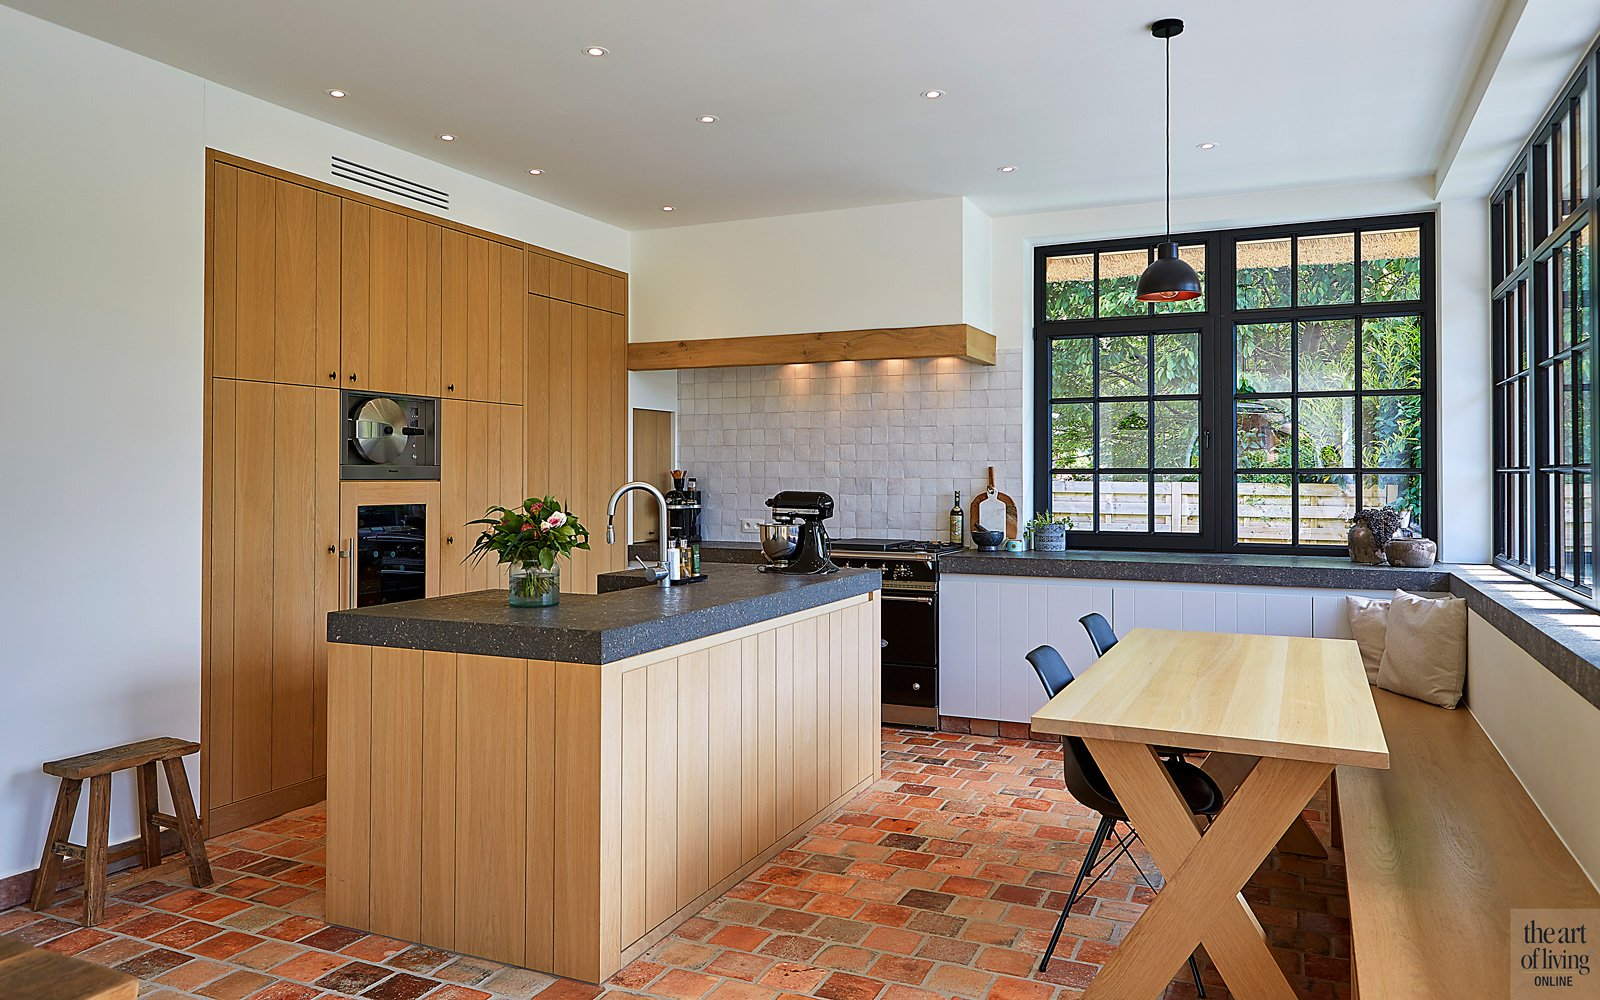 Houten keuken, maatwerk, Frank Tach Keukens